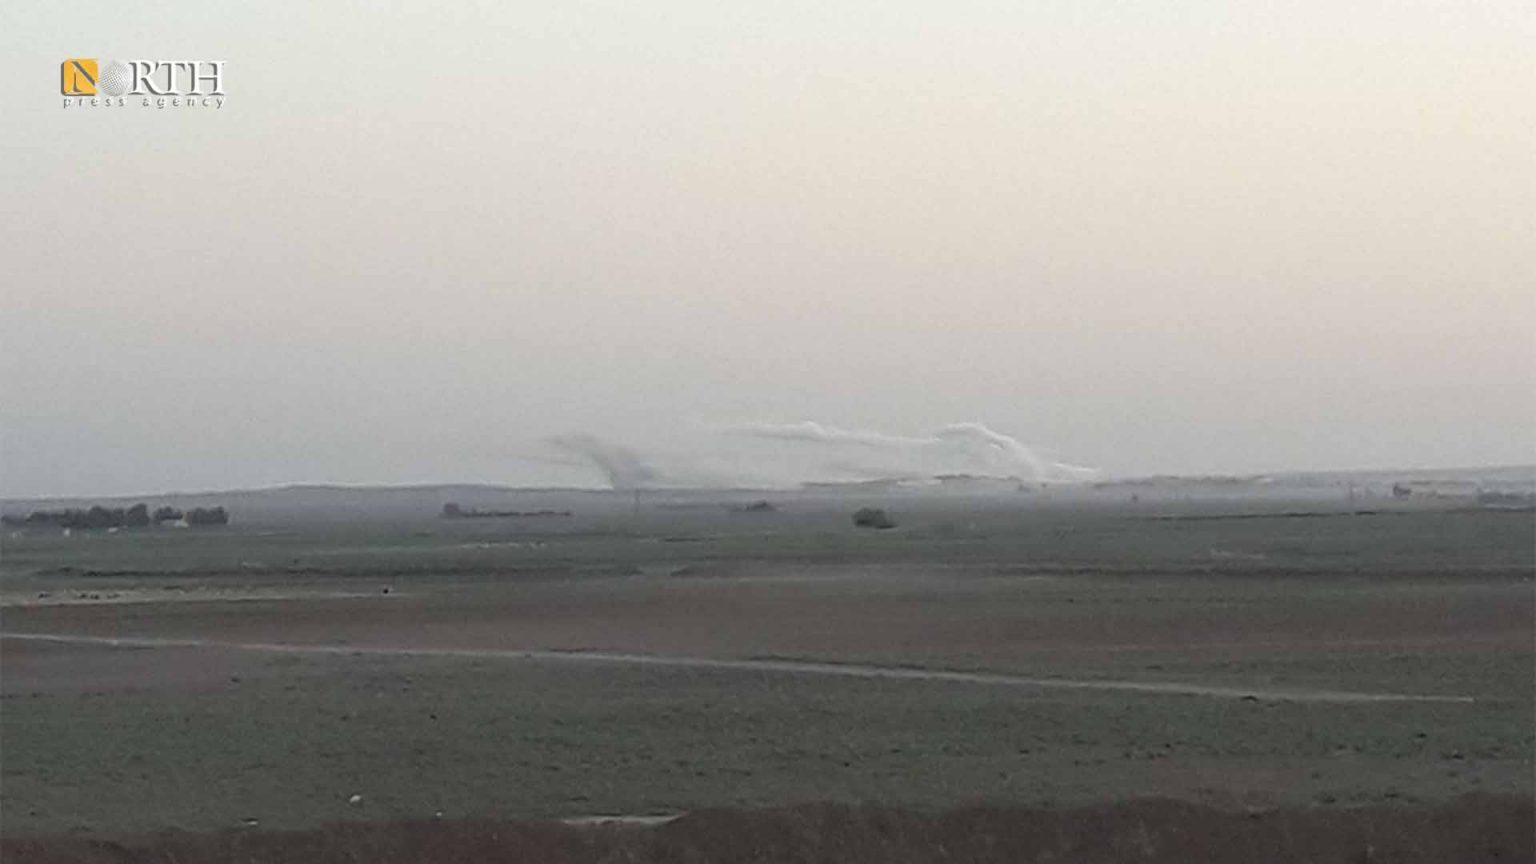 Turkish bombardment on al-Dardara village, Tel Tamr countryside – North Press/archive